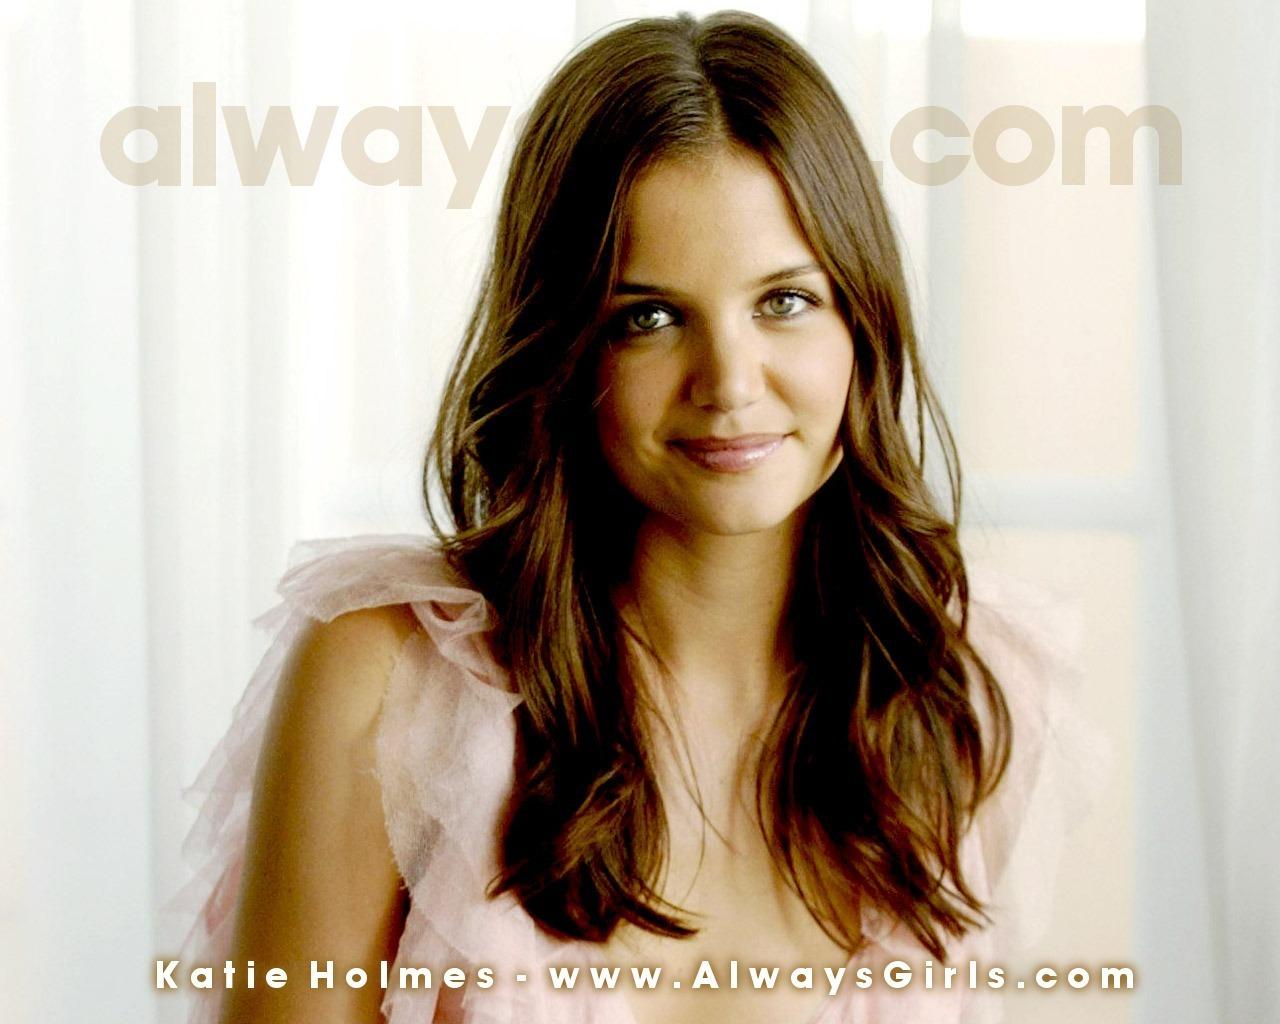 Katie Holmes images Ka...